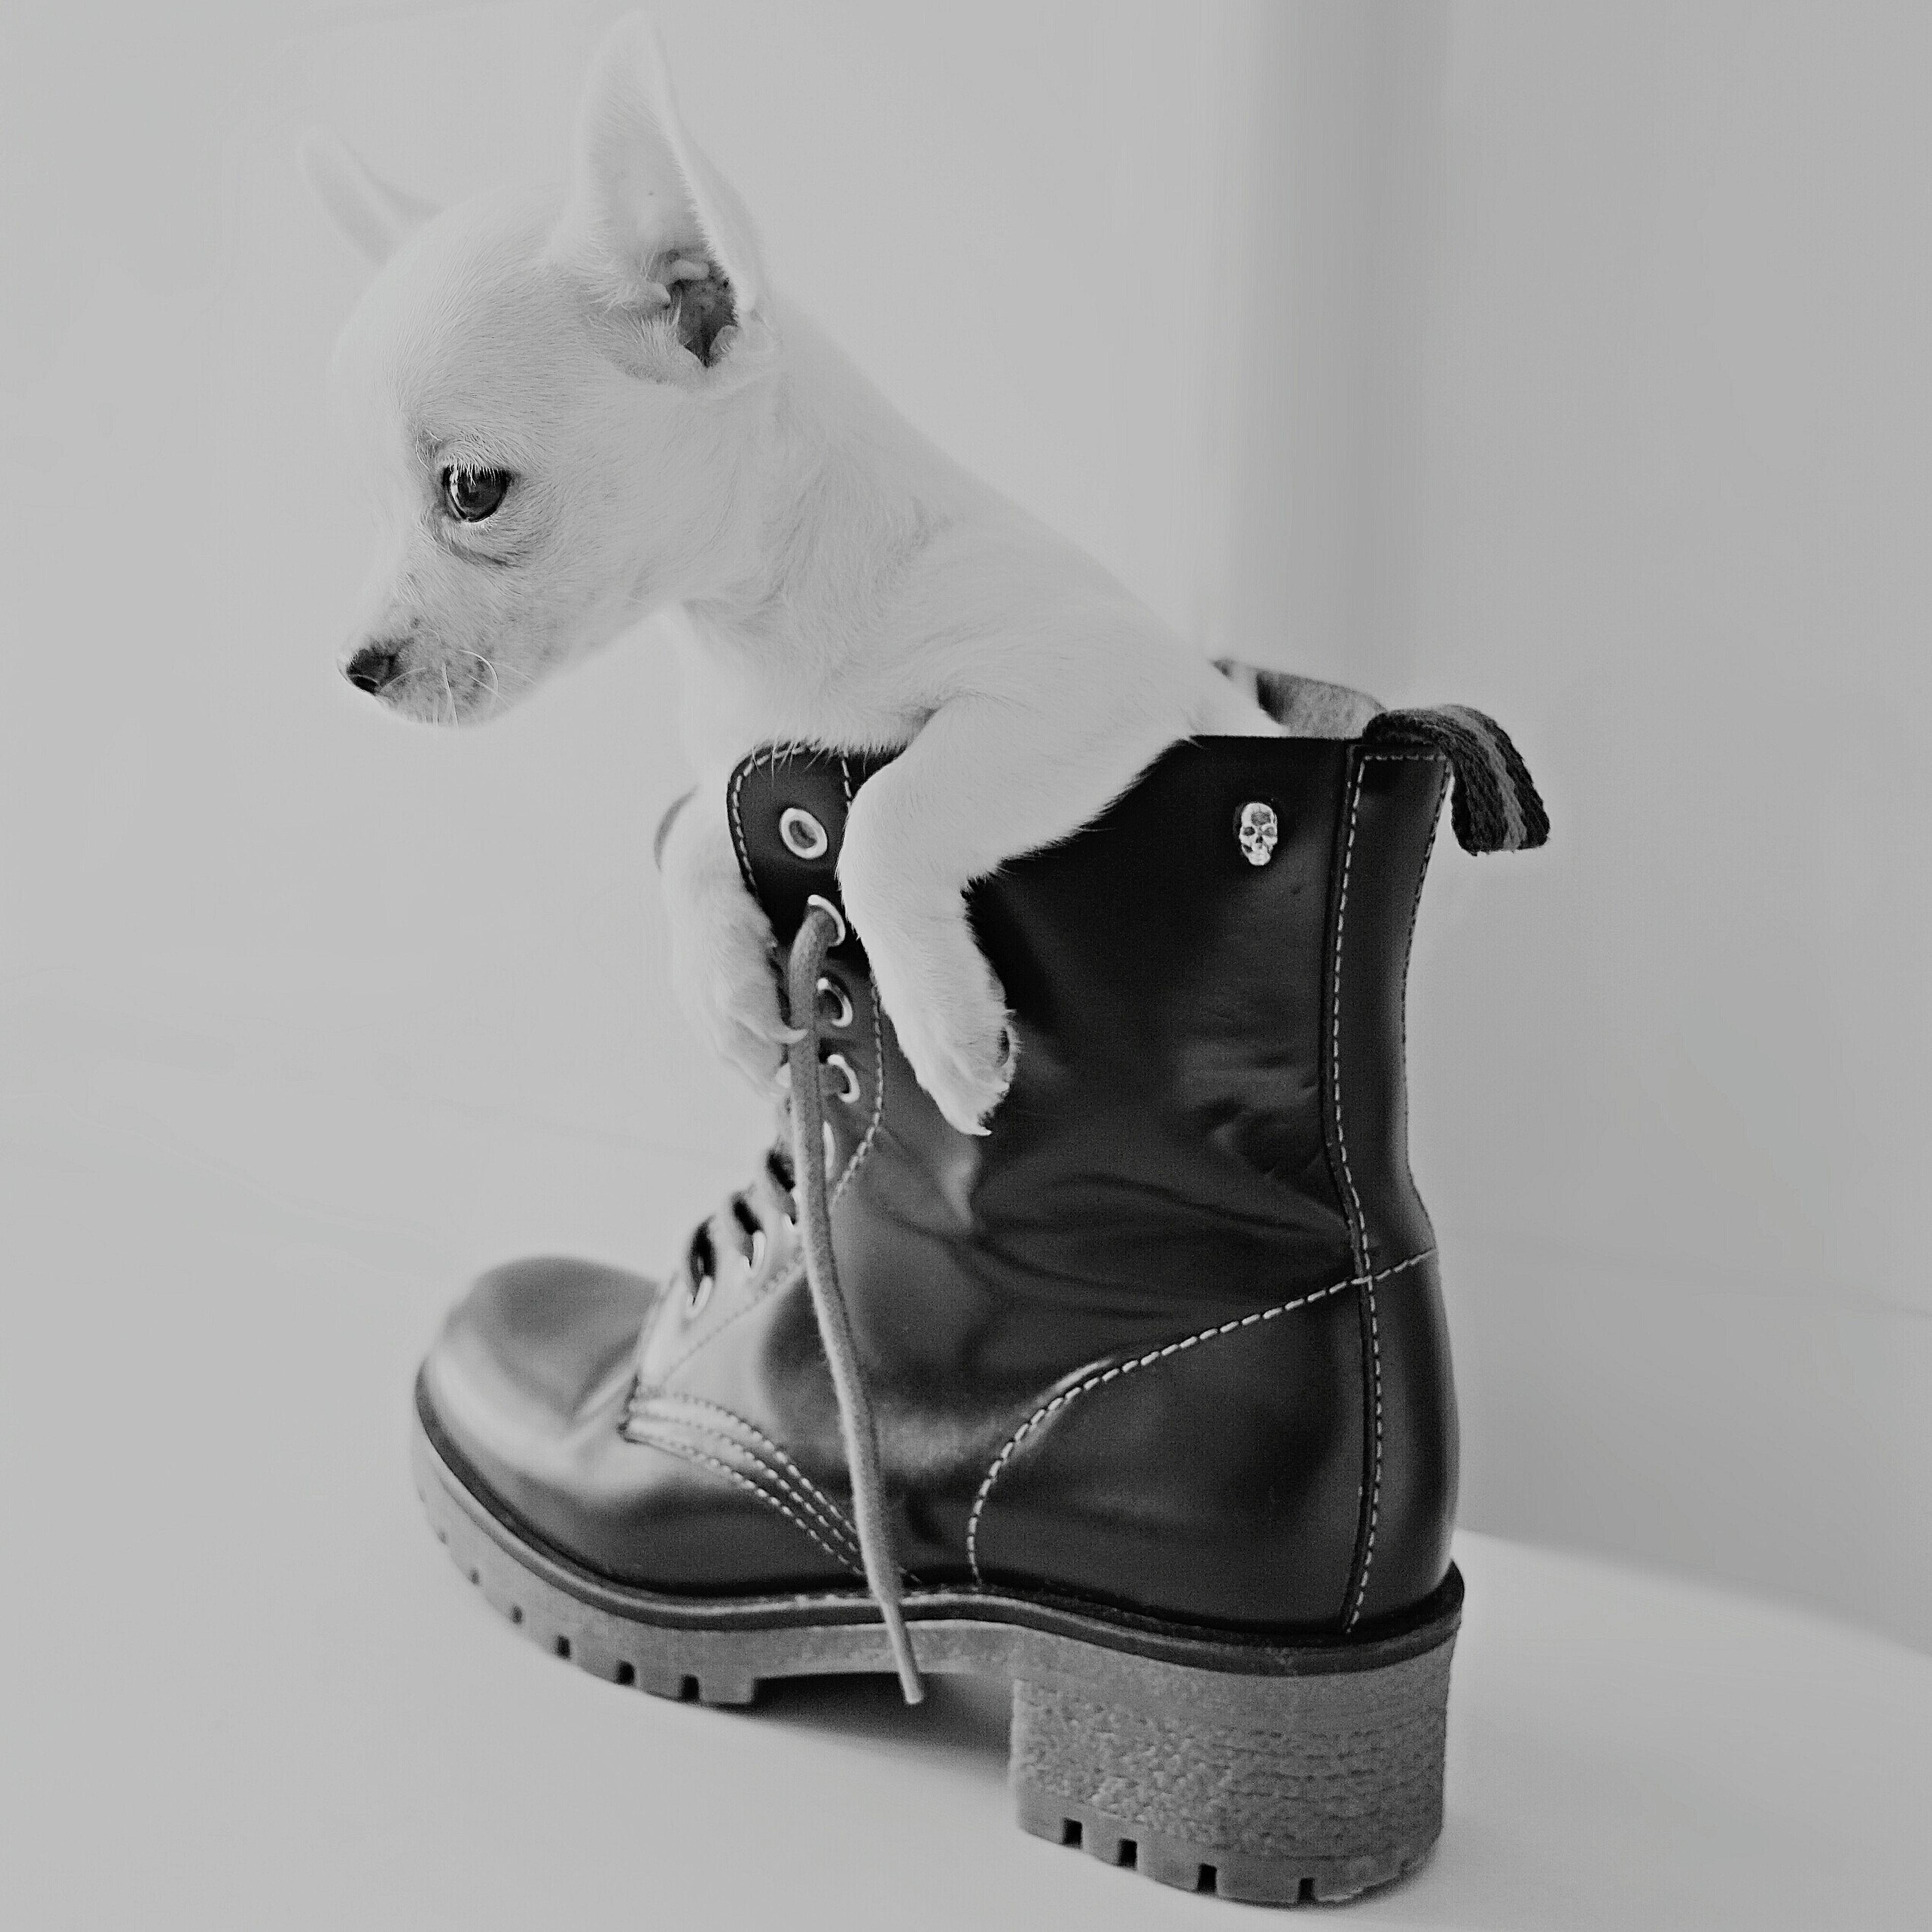 innocence Photographer Photoshoot Pic Shadows Shoot Black Blackandwhite Light Dog Animal Dark Pet Puppy Shooting Light And Shadow Elégance Innocence